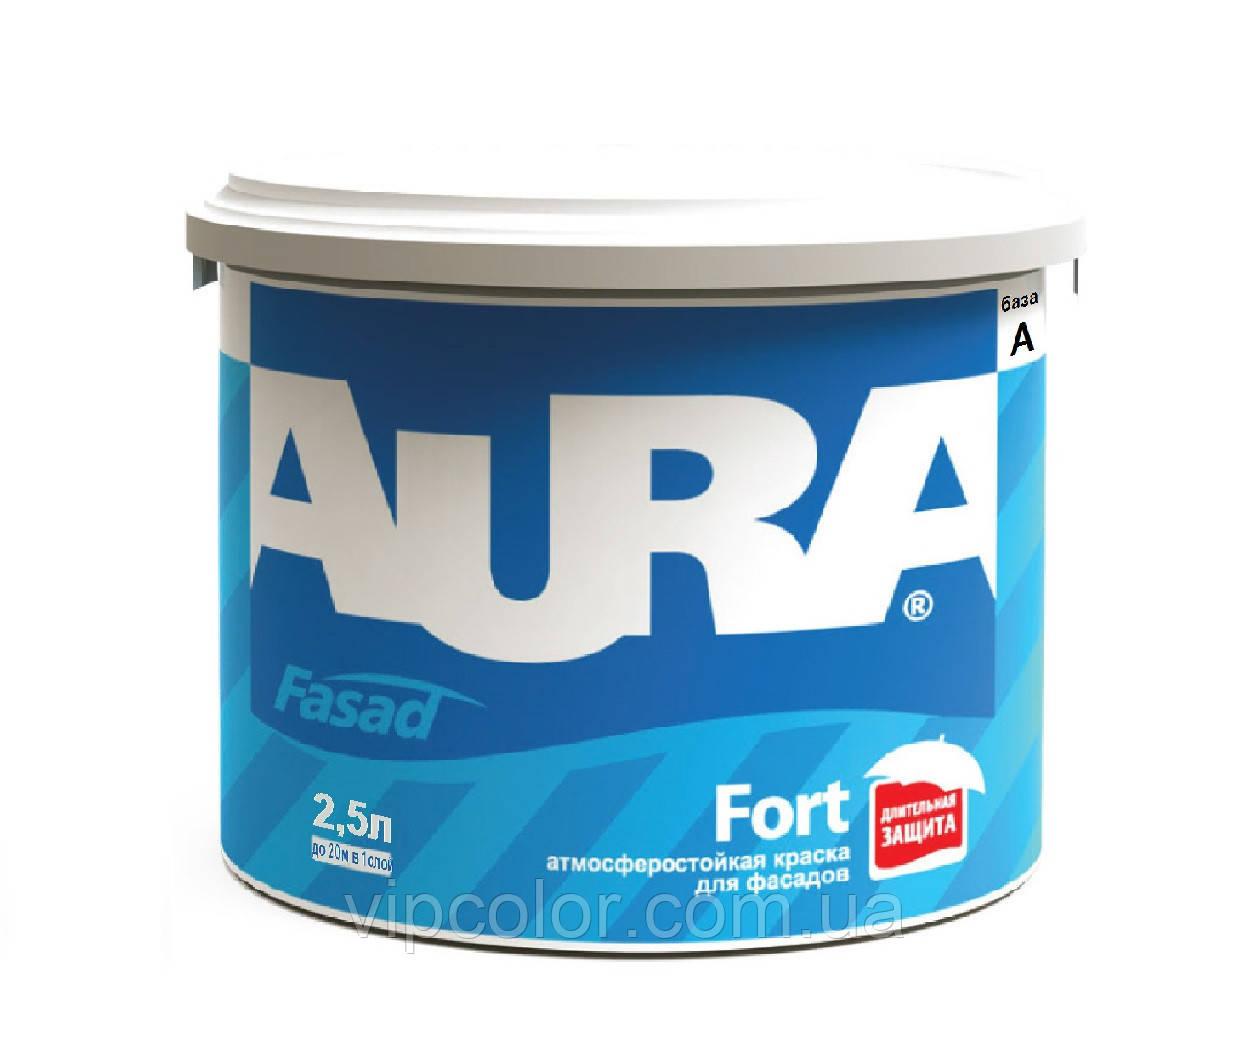 Aura Fasad Fort Белая 5 л фасадная краска матовая арт.4820166521333